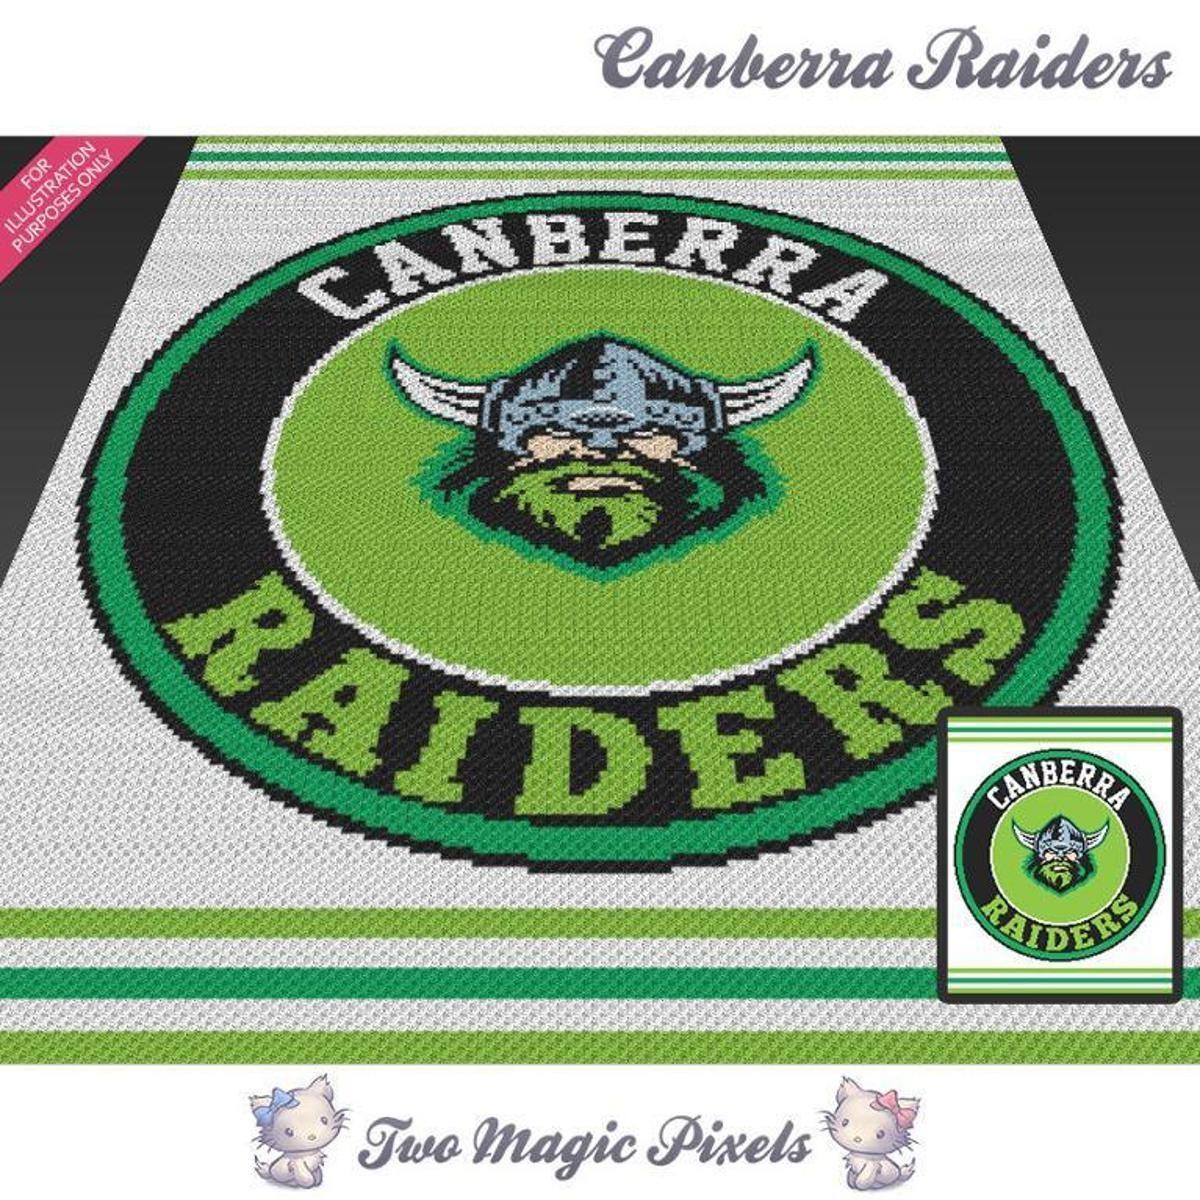 Canberra Raiders Crochet Graph